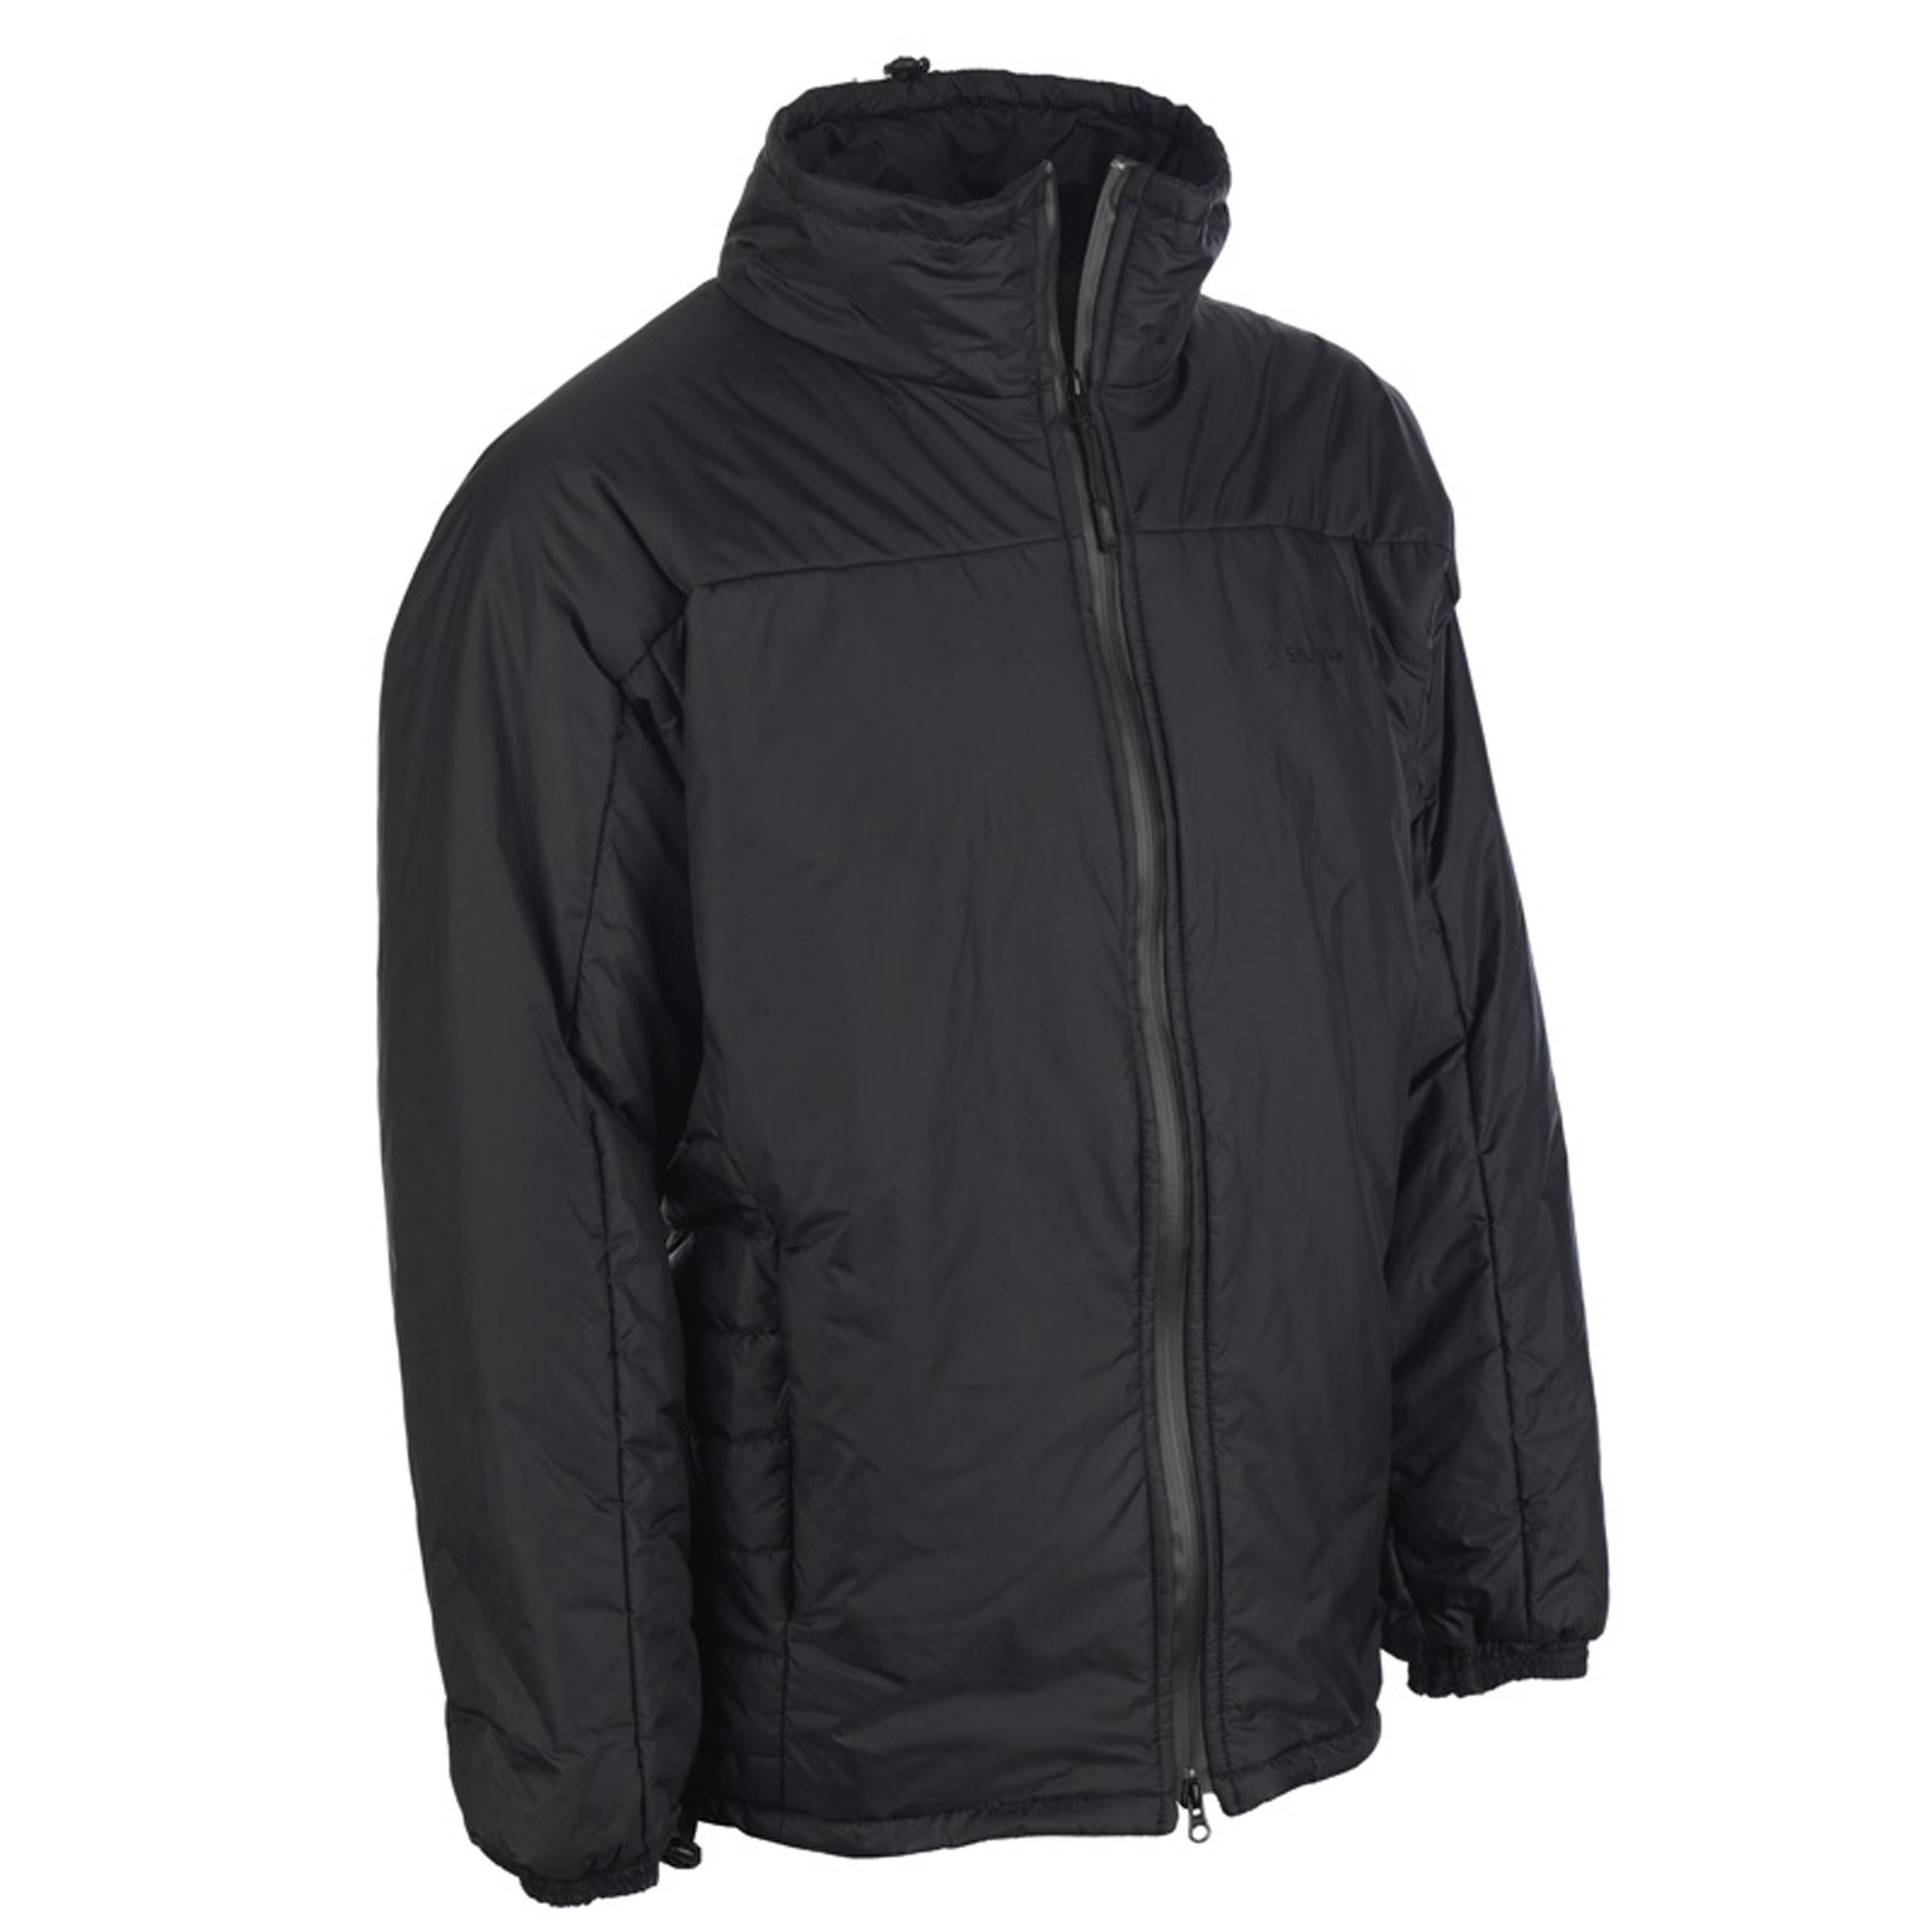 Snugpak Sj9 Jacket Black Lg